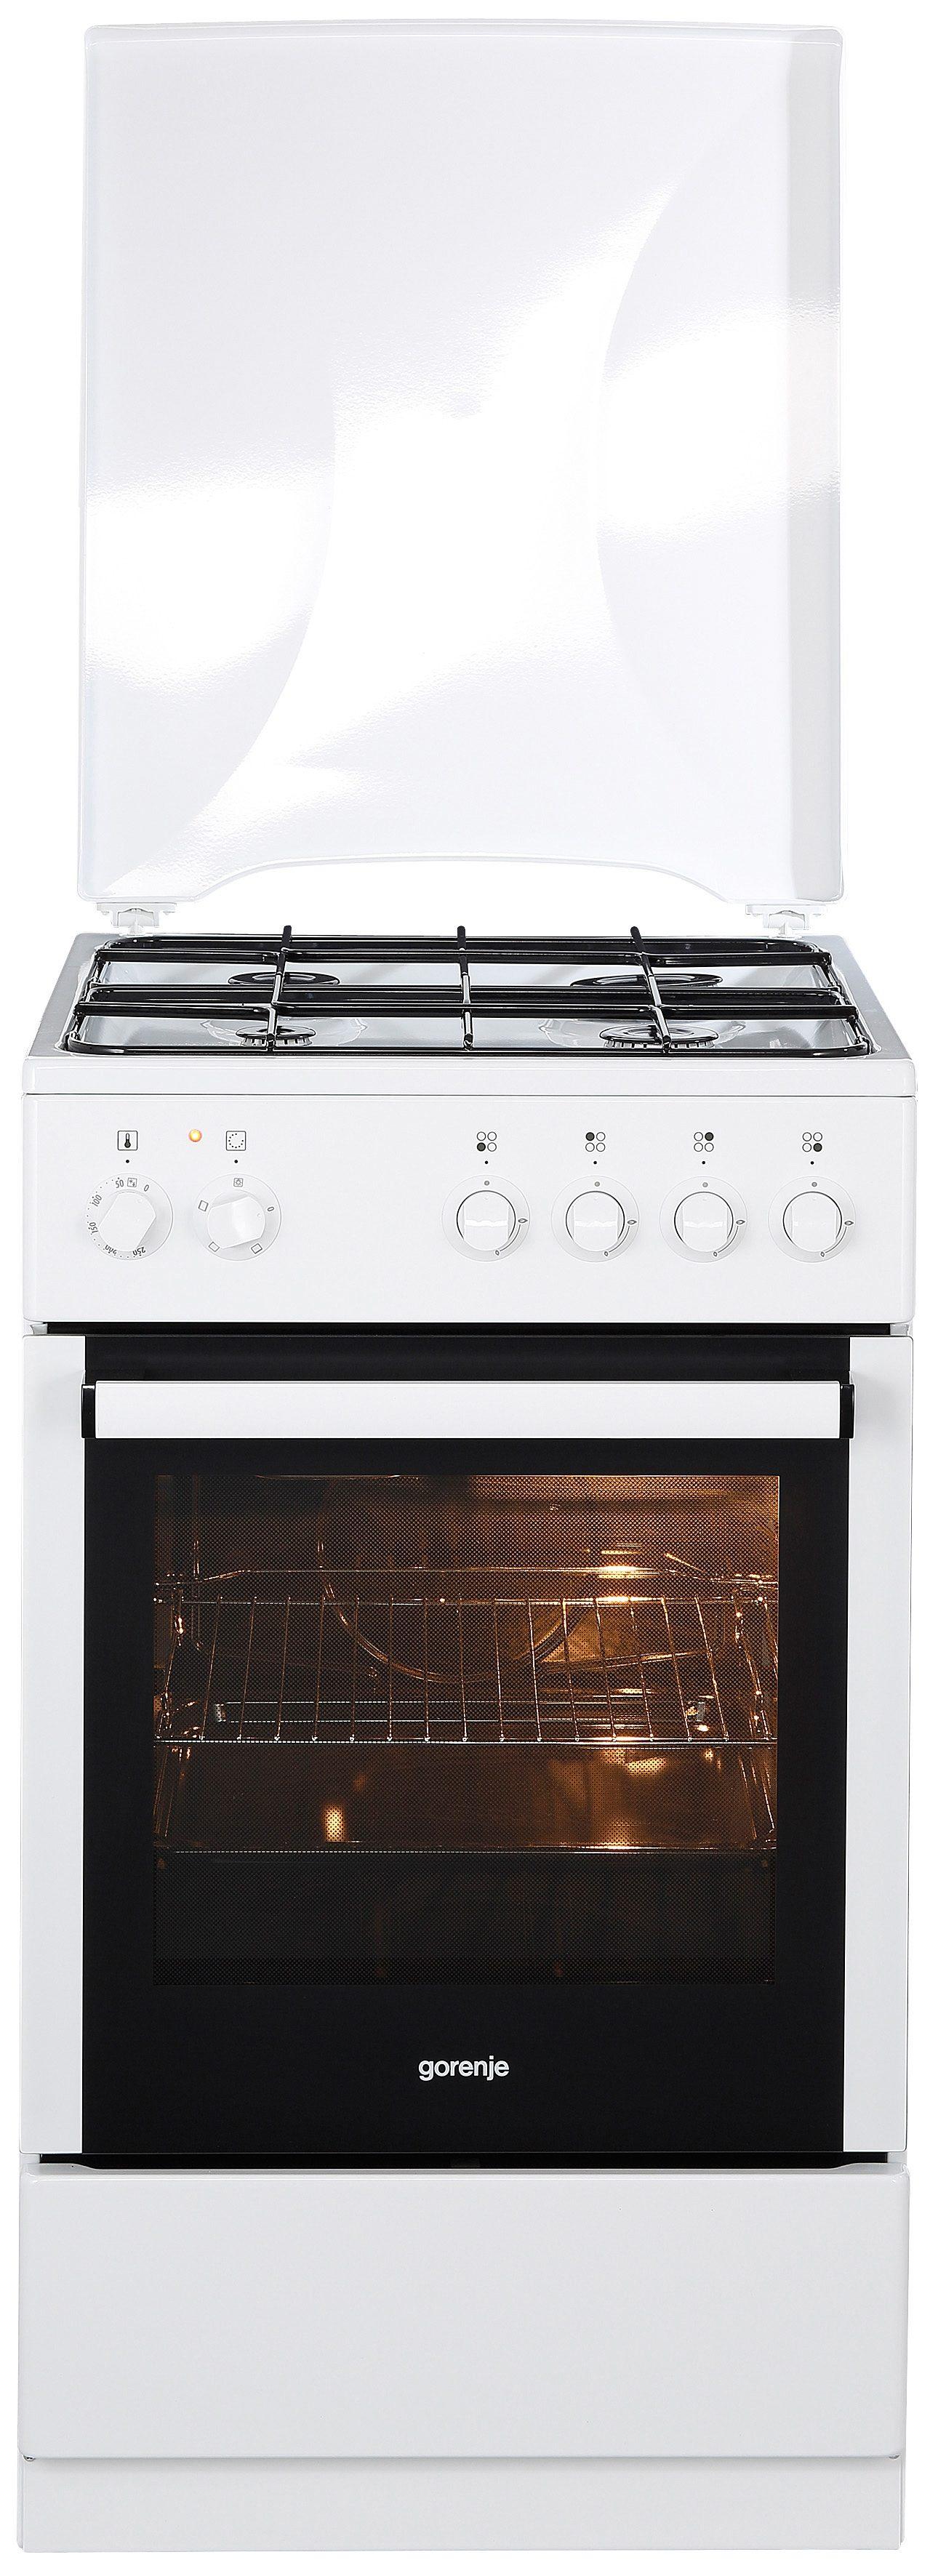 Gorenje Gas-Elektro-Standherd K 51101 AW, A, 50 cm breit